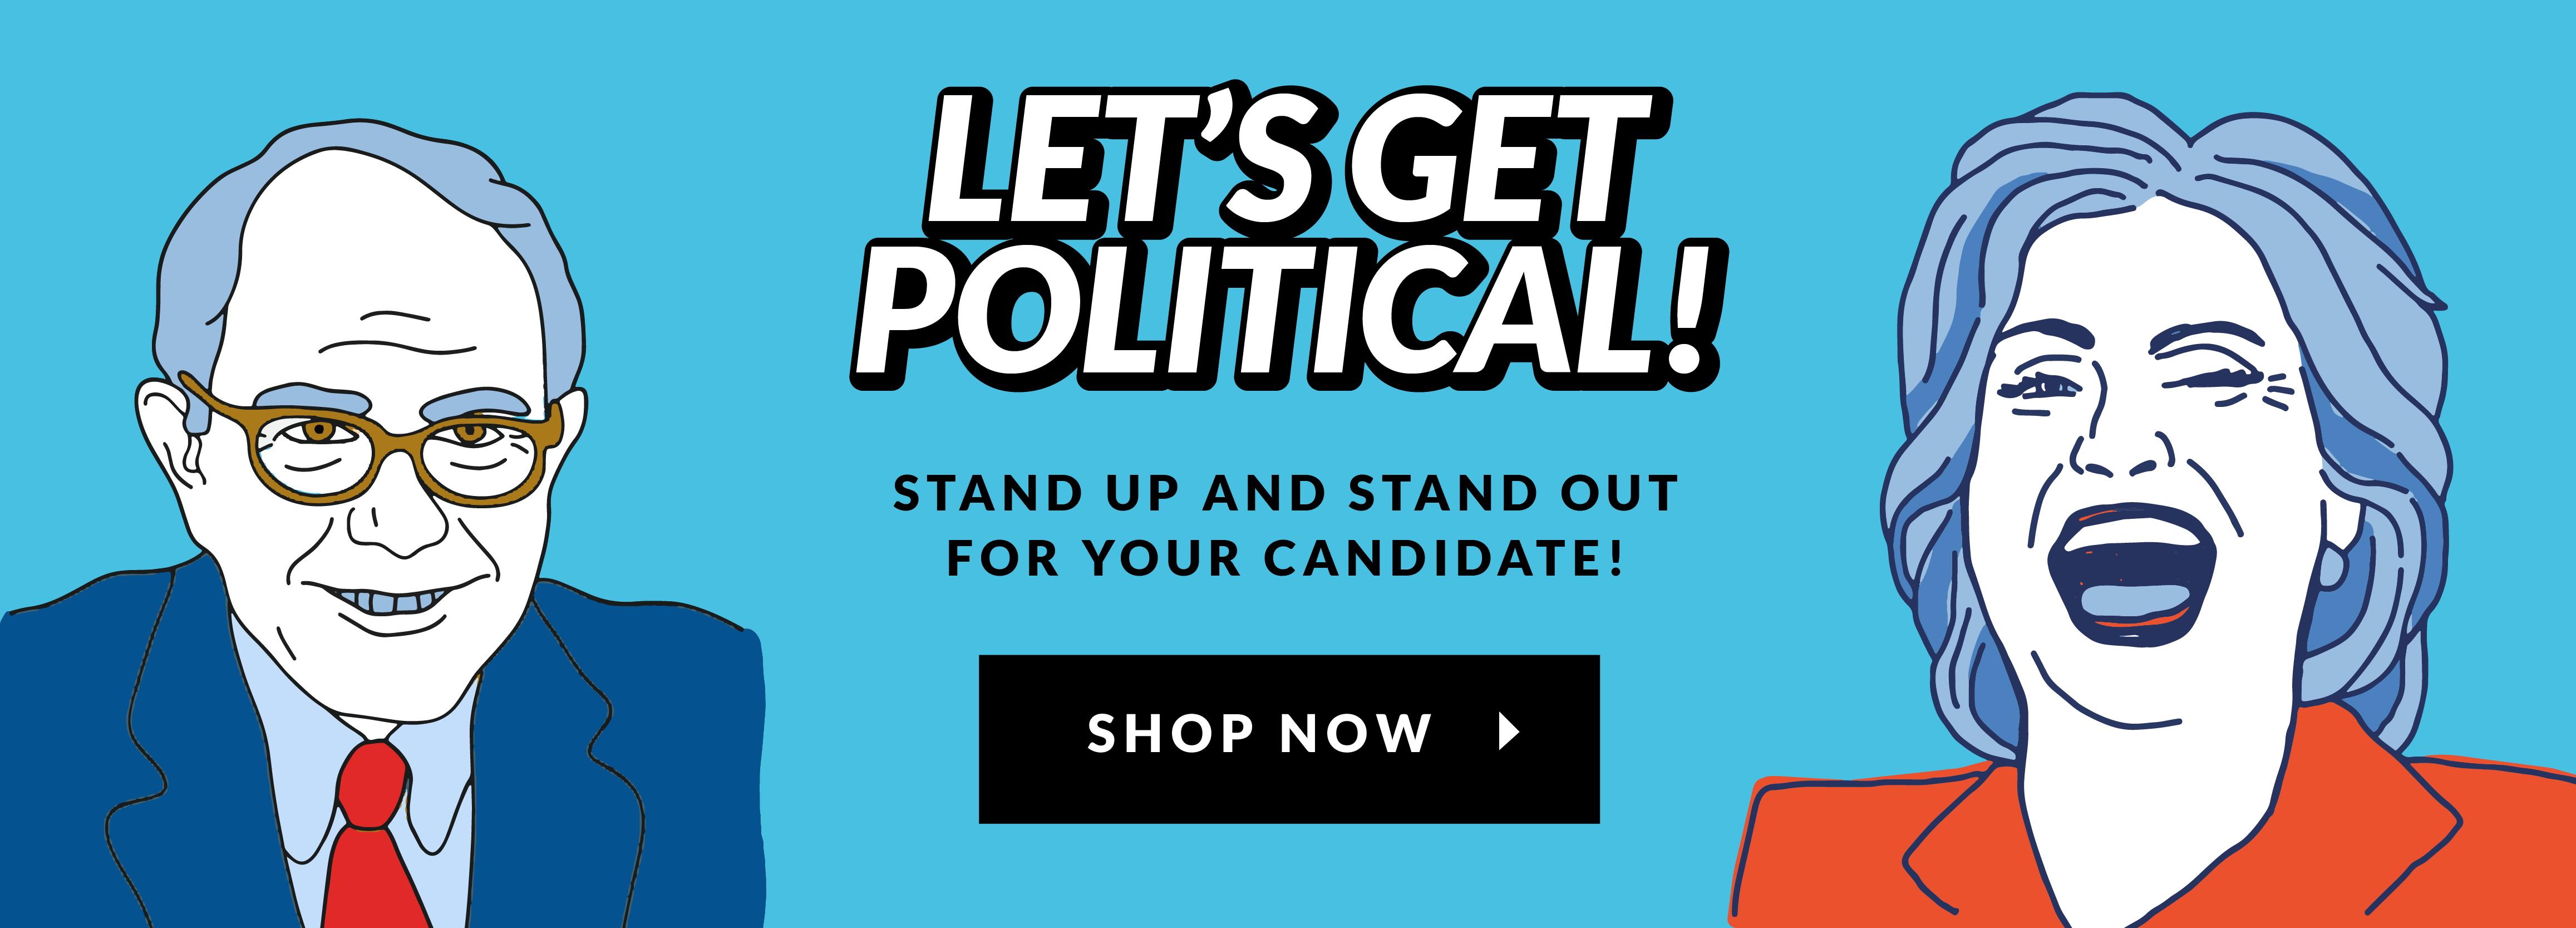 Let's Get Political! - Look HUMAN